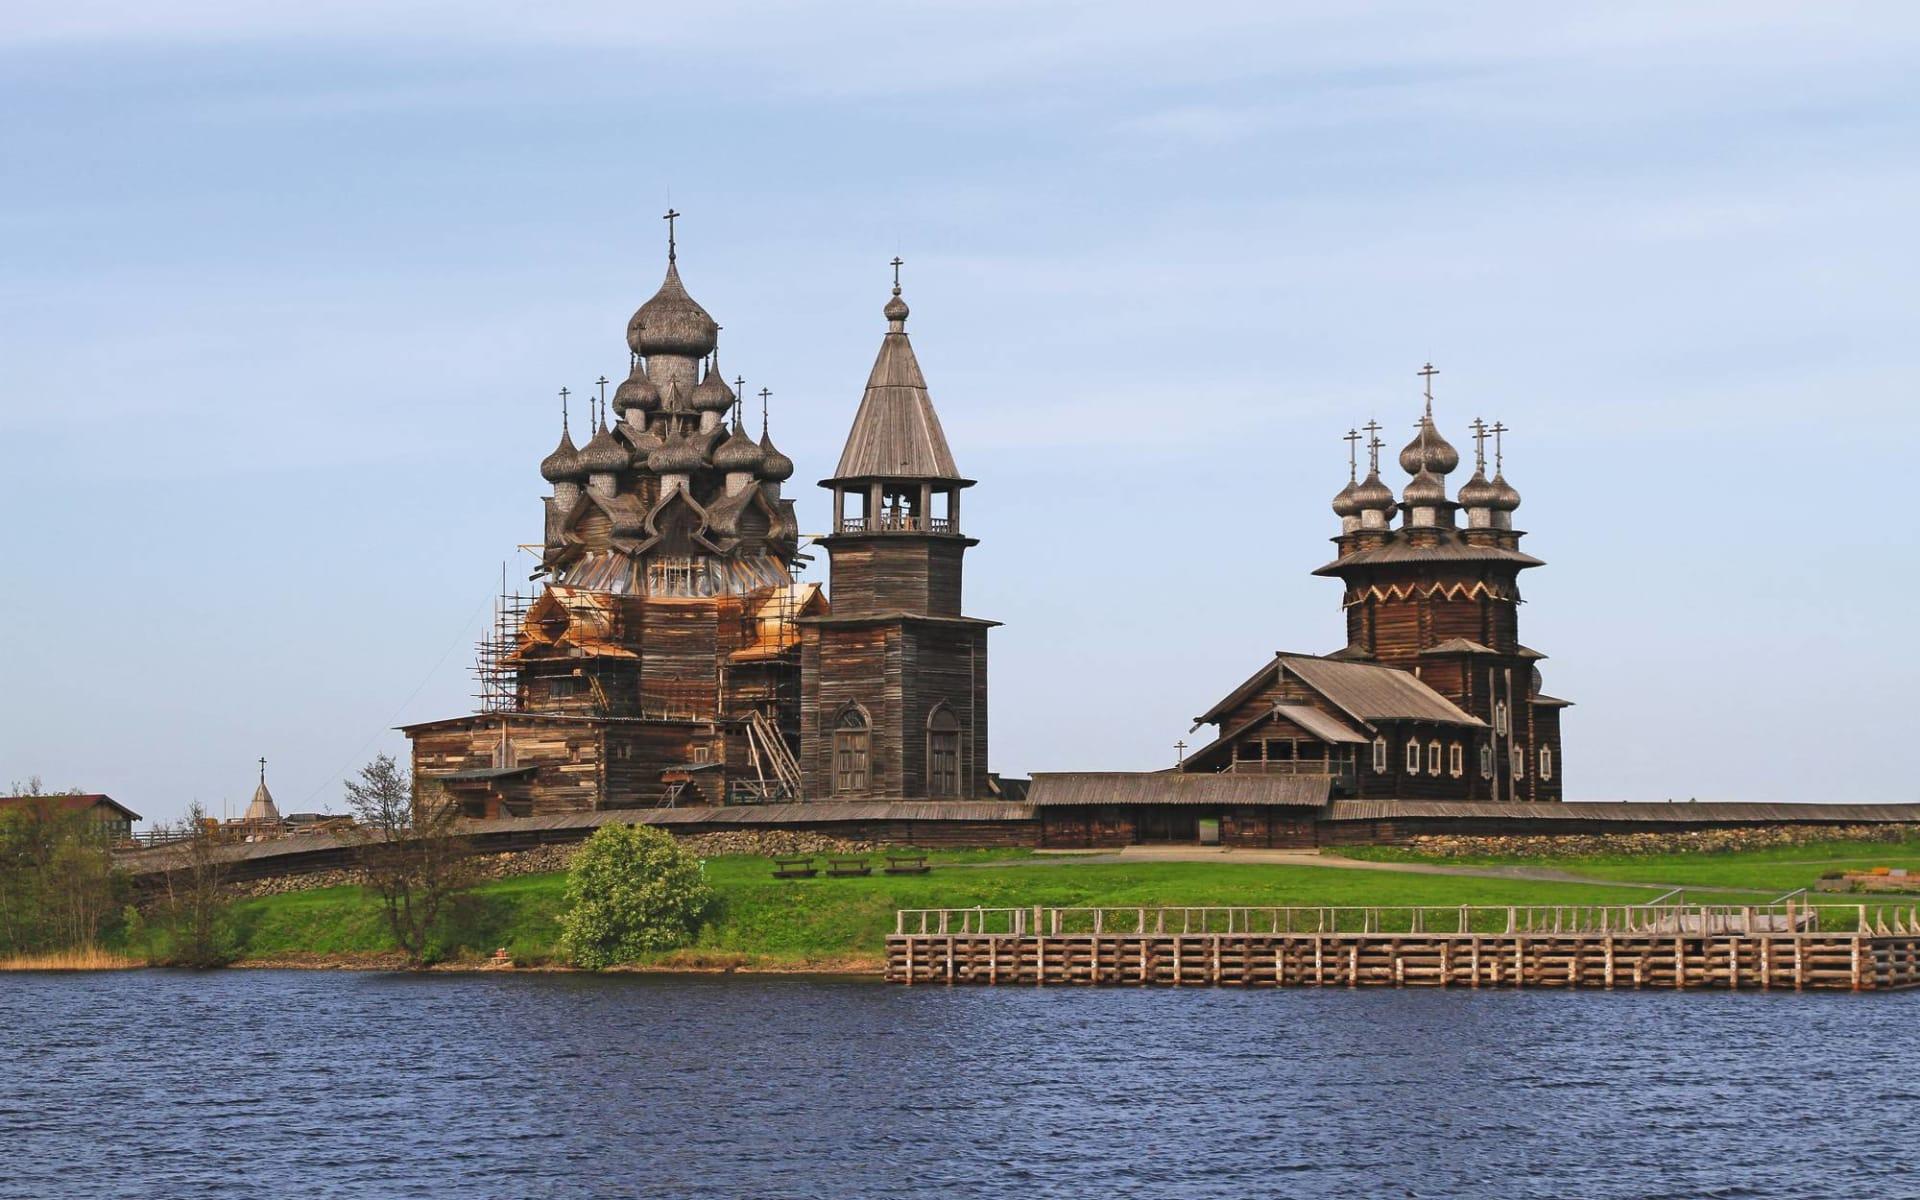 Bezauberndes Karelien ab St. Petersburg: Russland